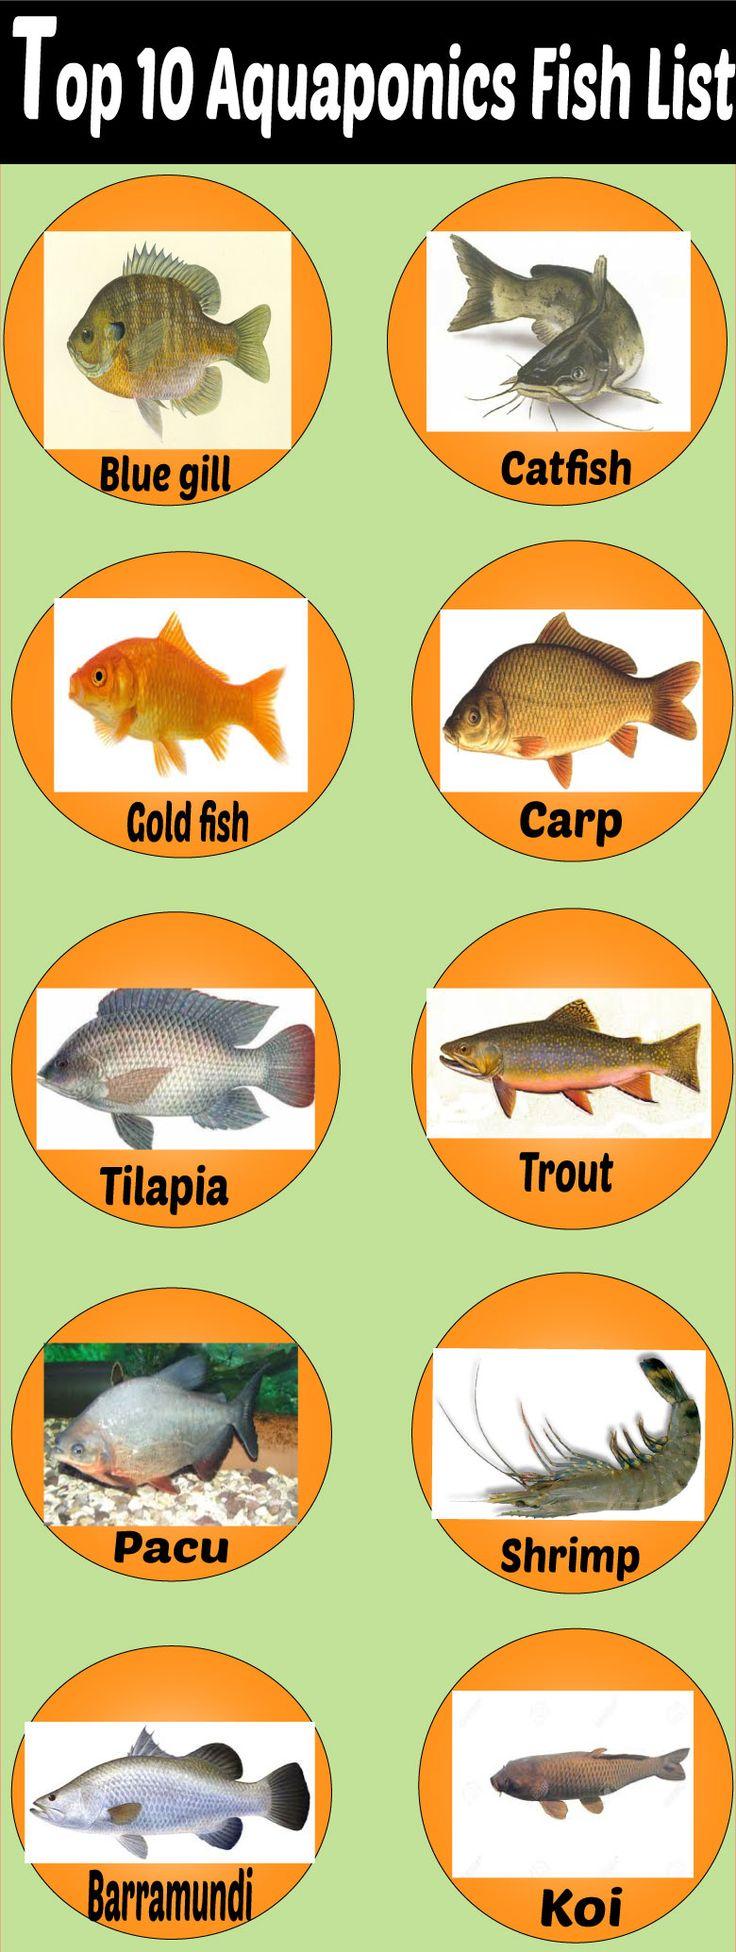 202 best aquaponics images on pinterest aquaponics system